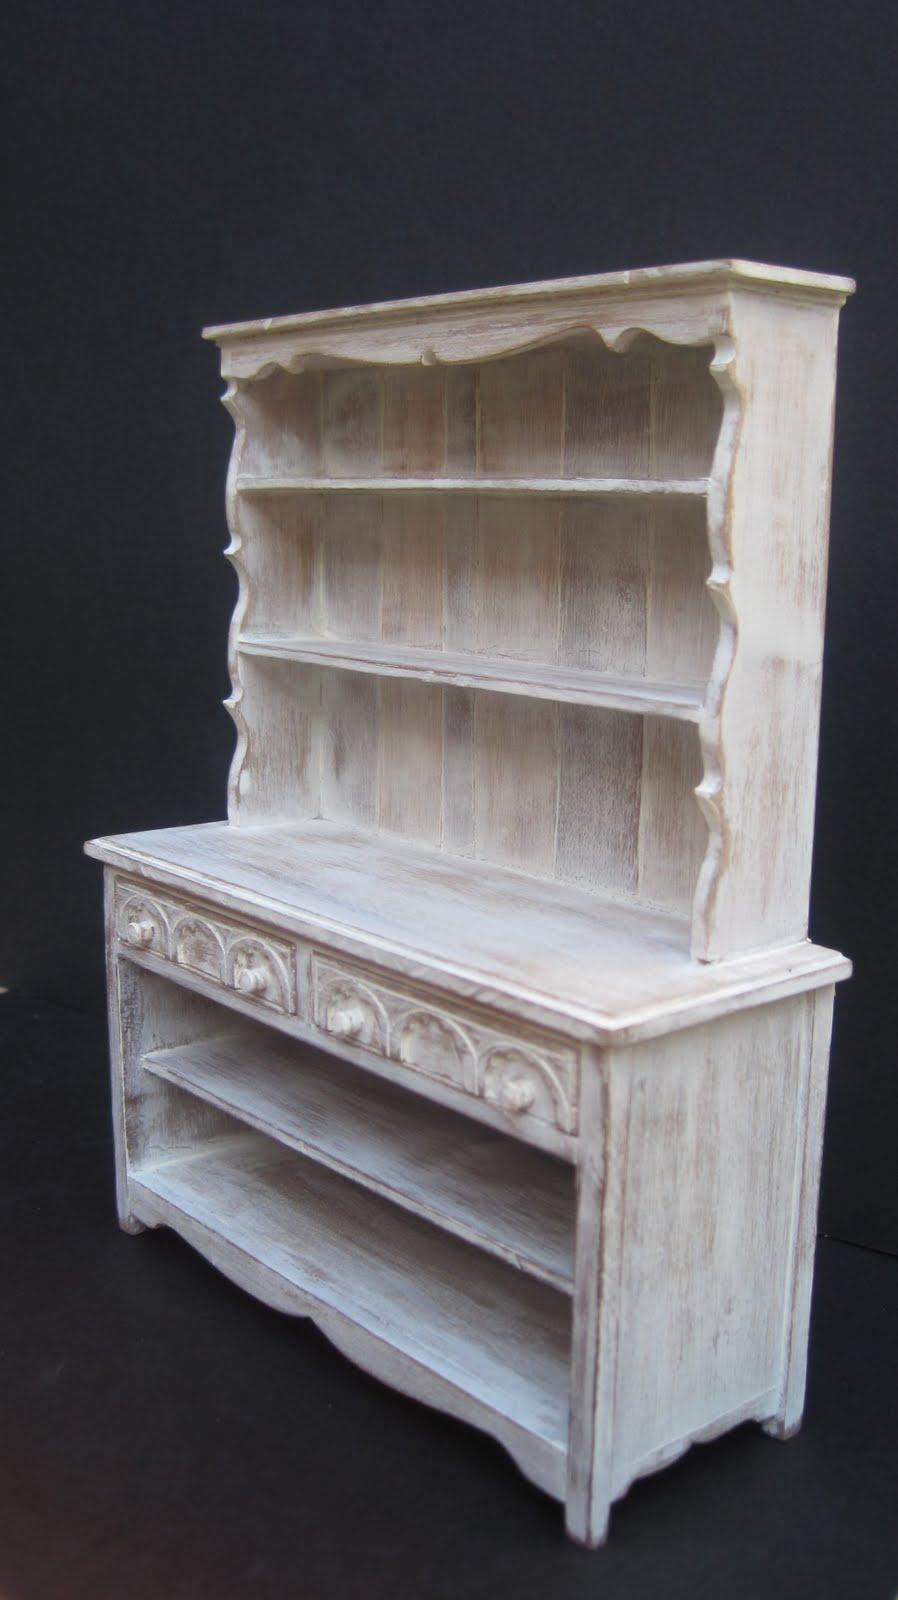 Muebles en miniatura miniature furniture mueble de cocina for Trasteros de madera